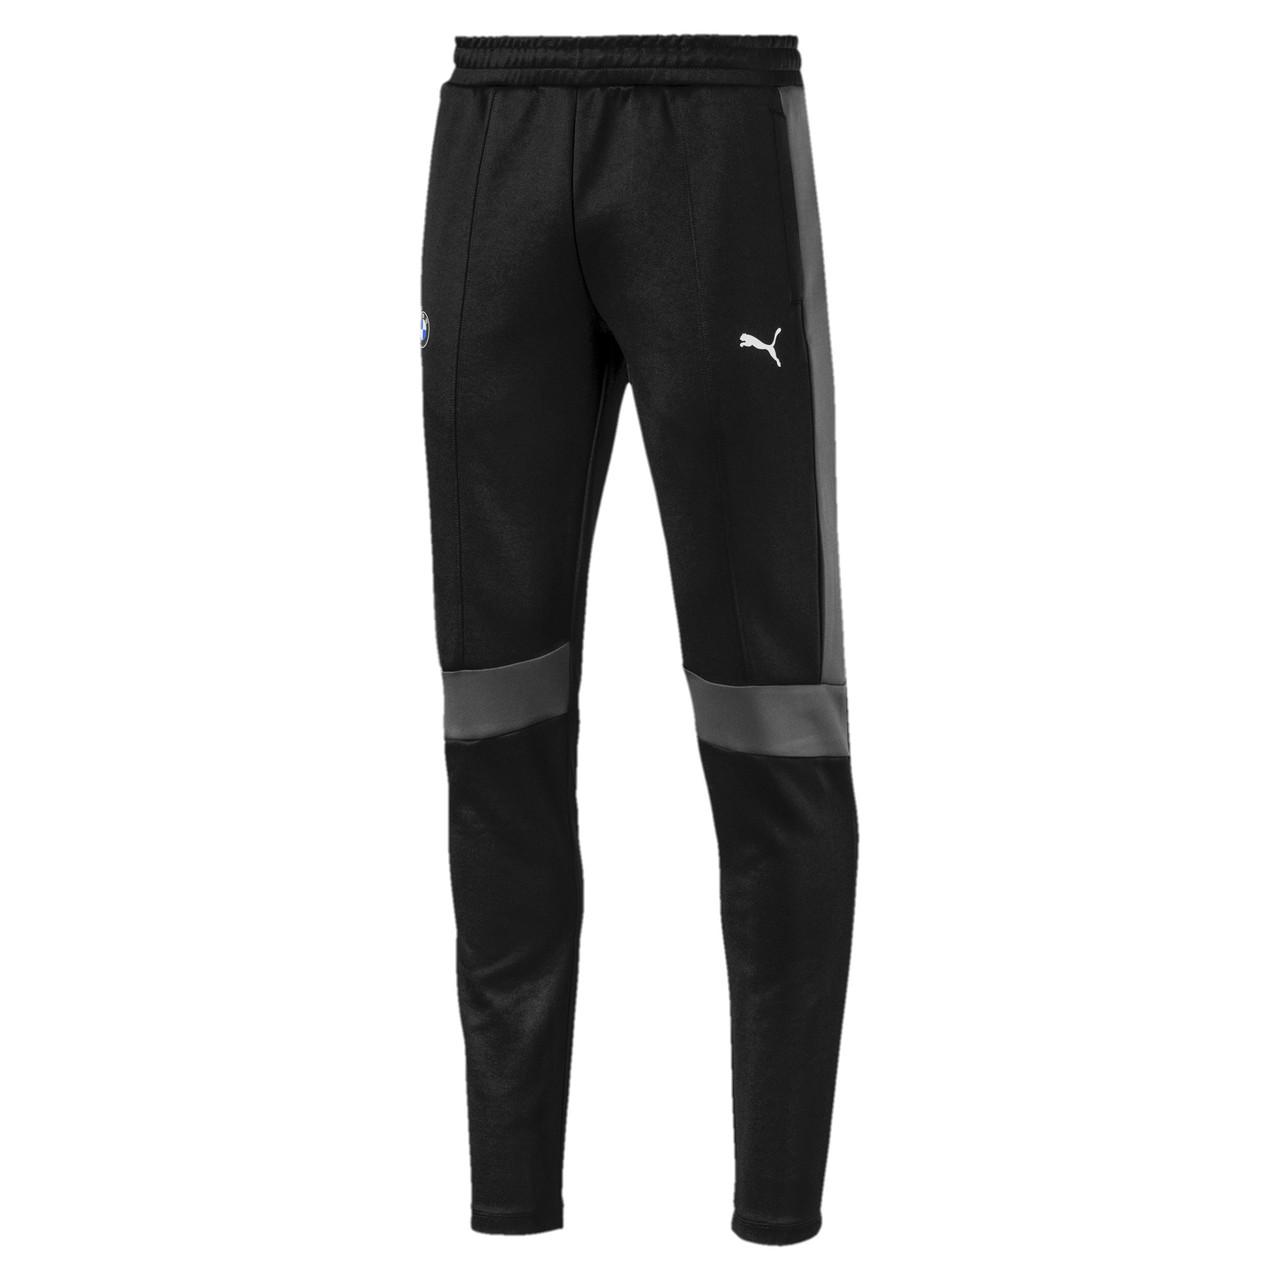 Мужские спортивные брюки Bmw Mms T7 Track